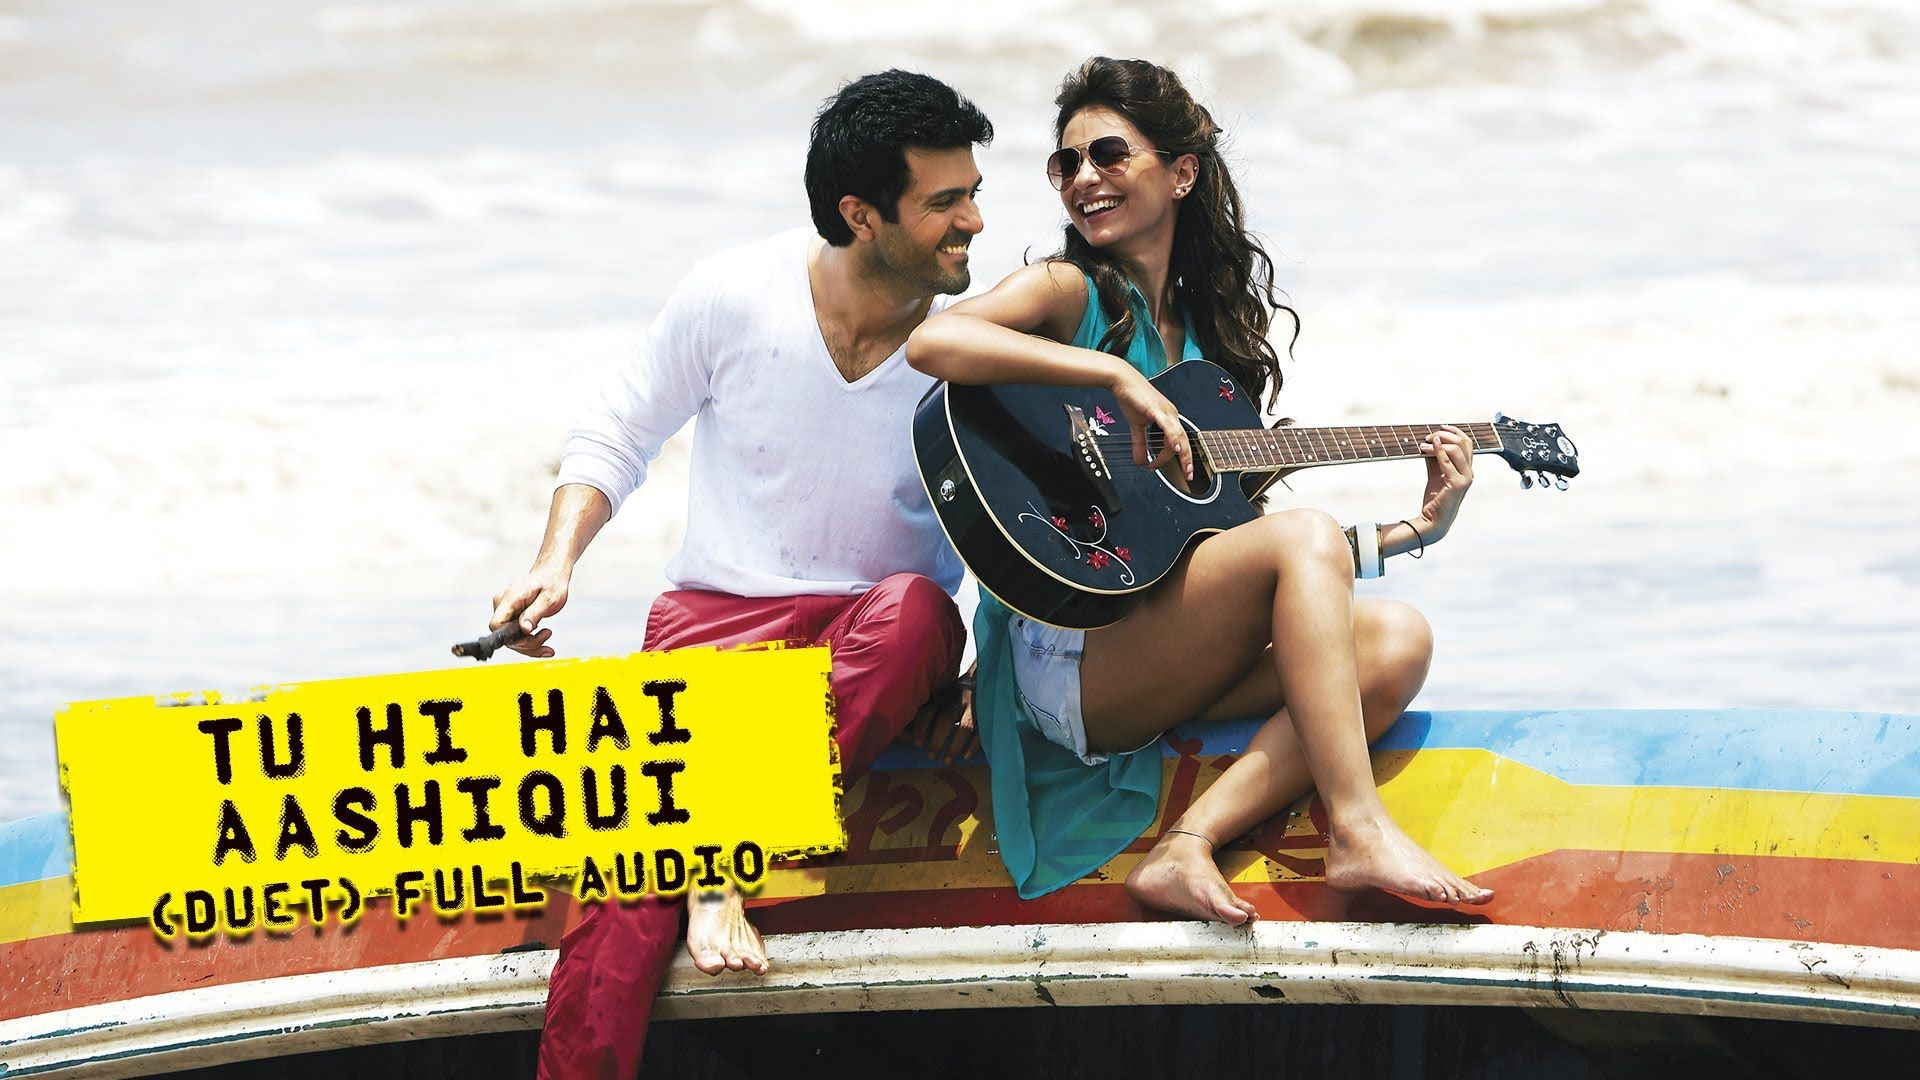 Tu Hi Hai Aashiqui (Duet) - Full Audio Song - Dishkiyaoon